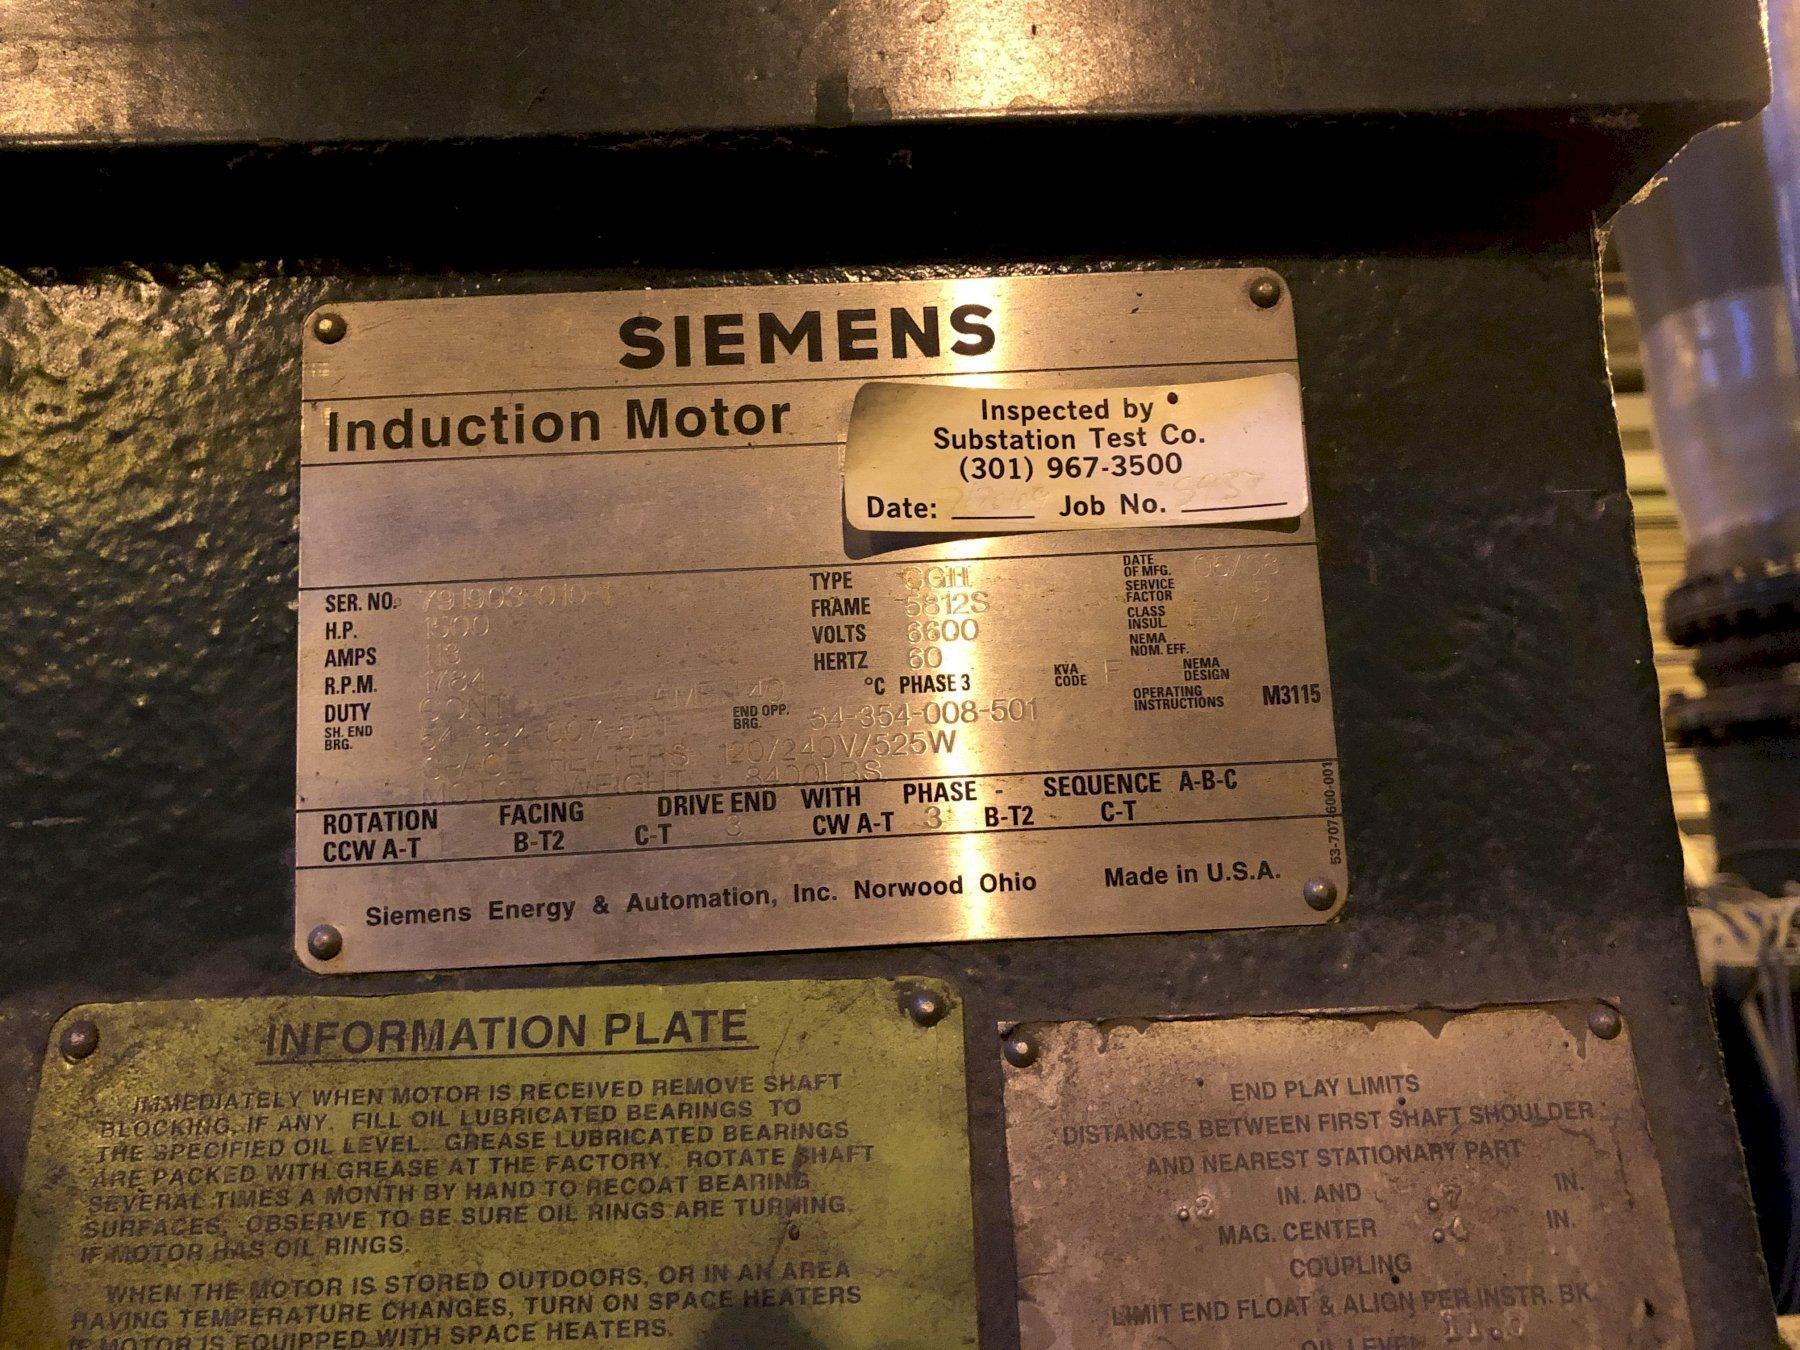 2008 recycle blower system with Siemens 1500 hp motor 6600 volt s/n 079172?020-1, Falk dolrs-gear-ooo2c gearbox, Harman 800gsl blower model 80tycslraamm163 s/n mds29987m